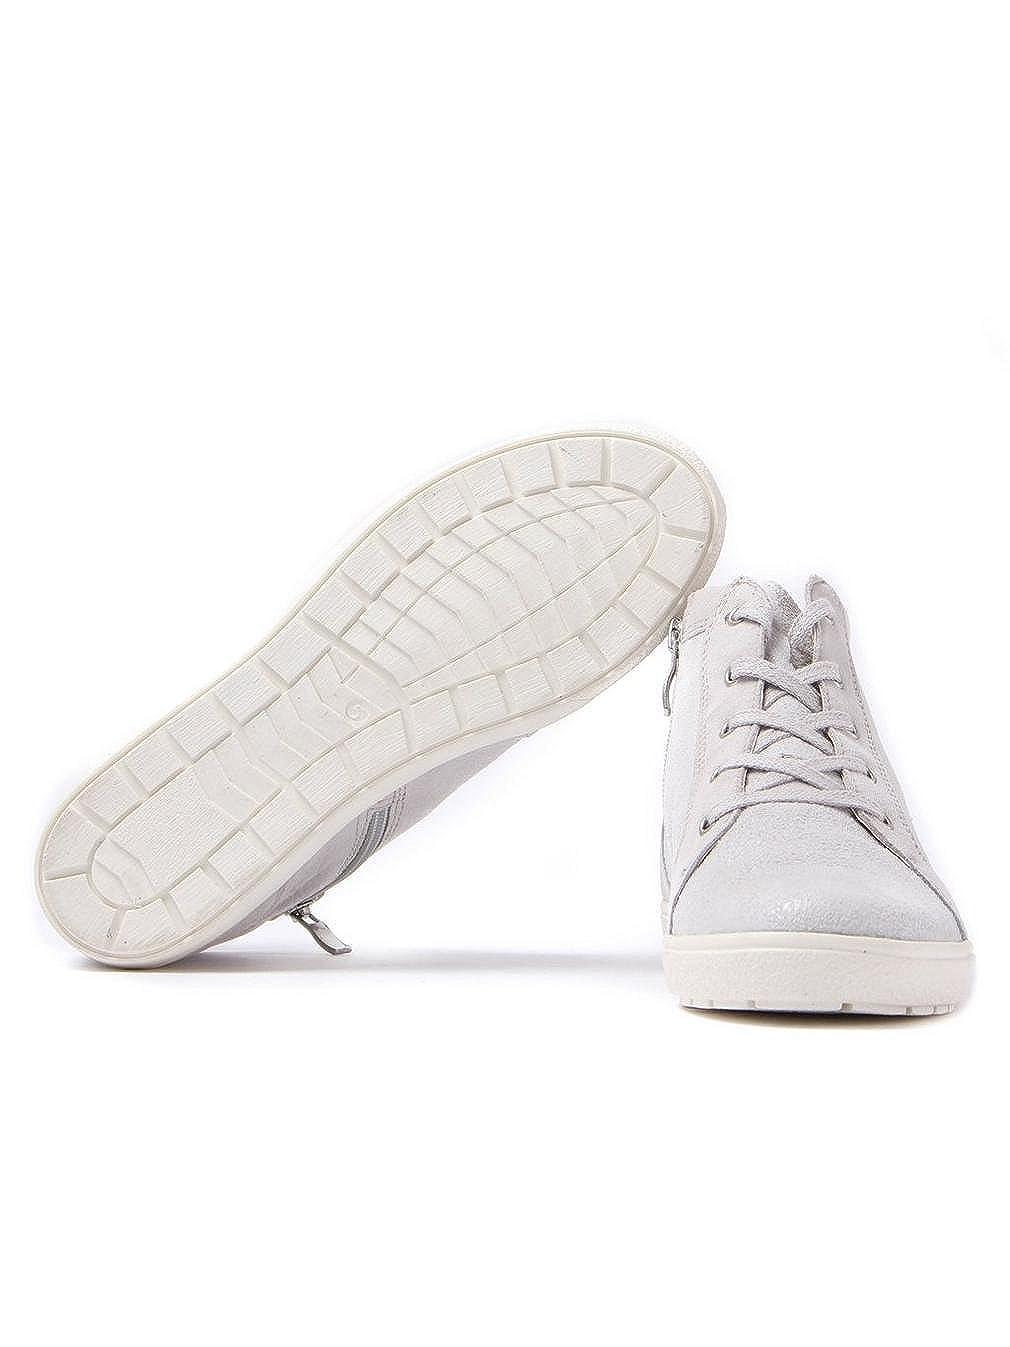 CAPRICE 9-25250-28 Damen Sneakers Sneakers Damen Grau(hellgrau) 9f1068